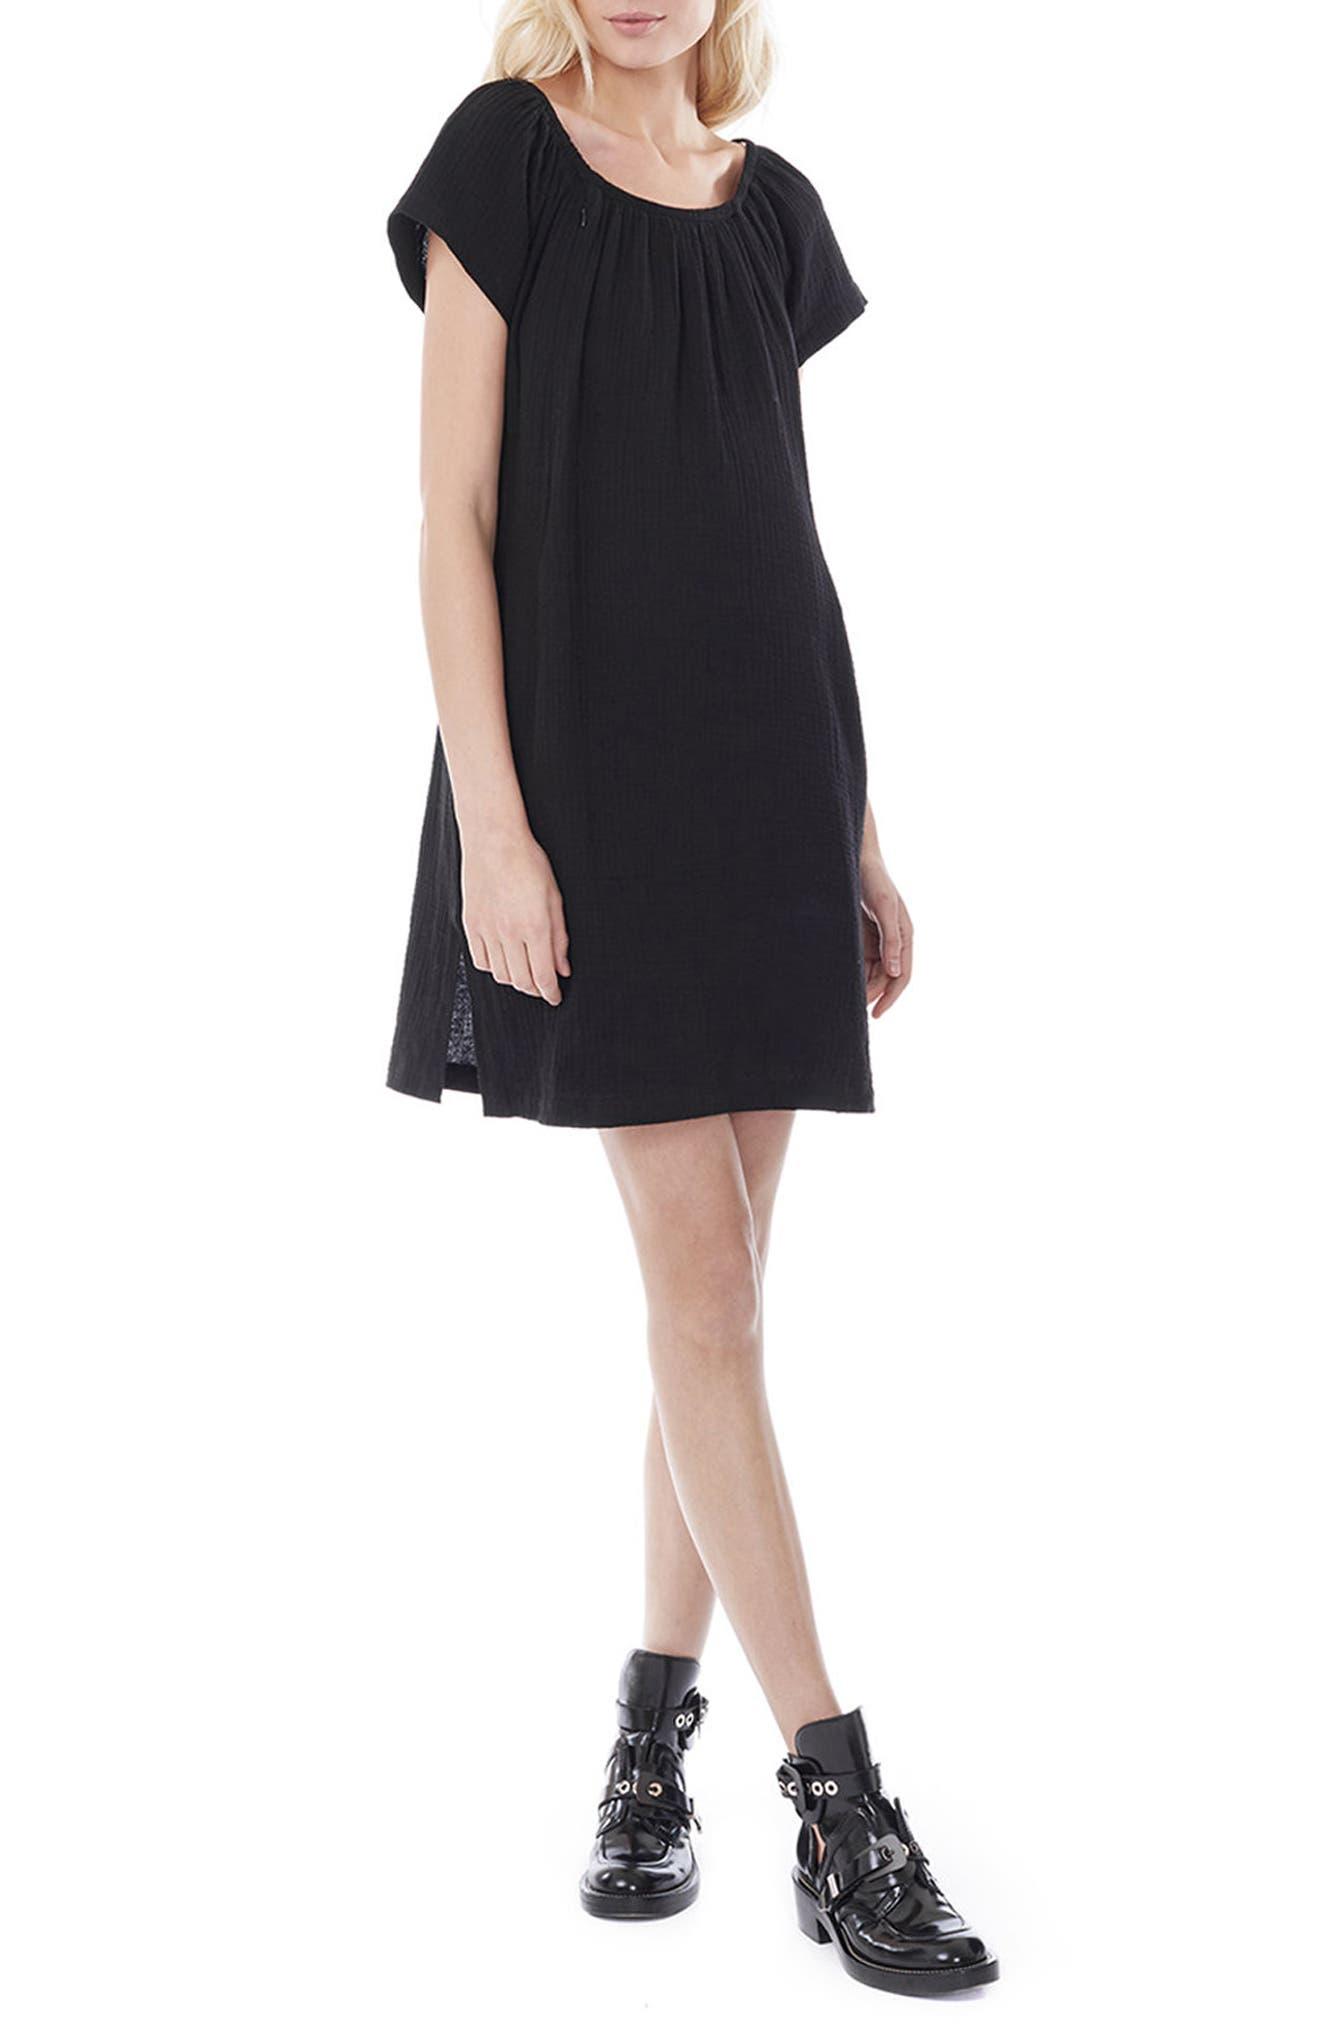 LOYAL HANA, Ariel Off The Shoulder Maternity/Nursing Dress, Alternate thumbnail 3, color, BLACK